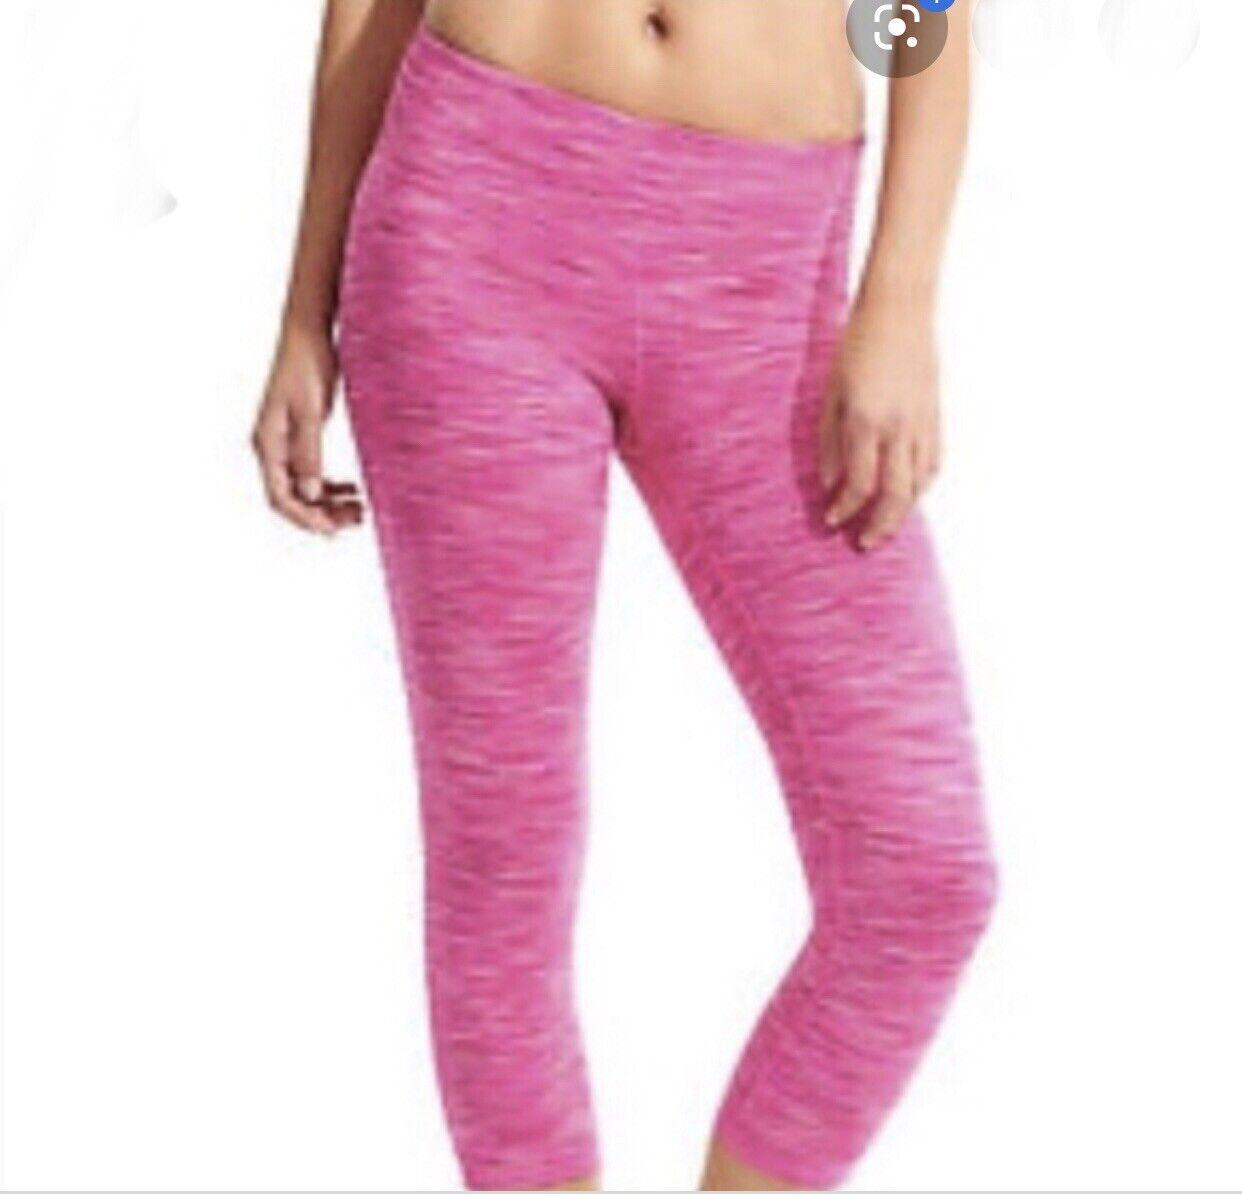 Athleta Chaturanga Capri KLEIN S Pink Space Dye Hose Gekürzt Leggings Eng